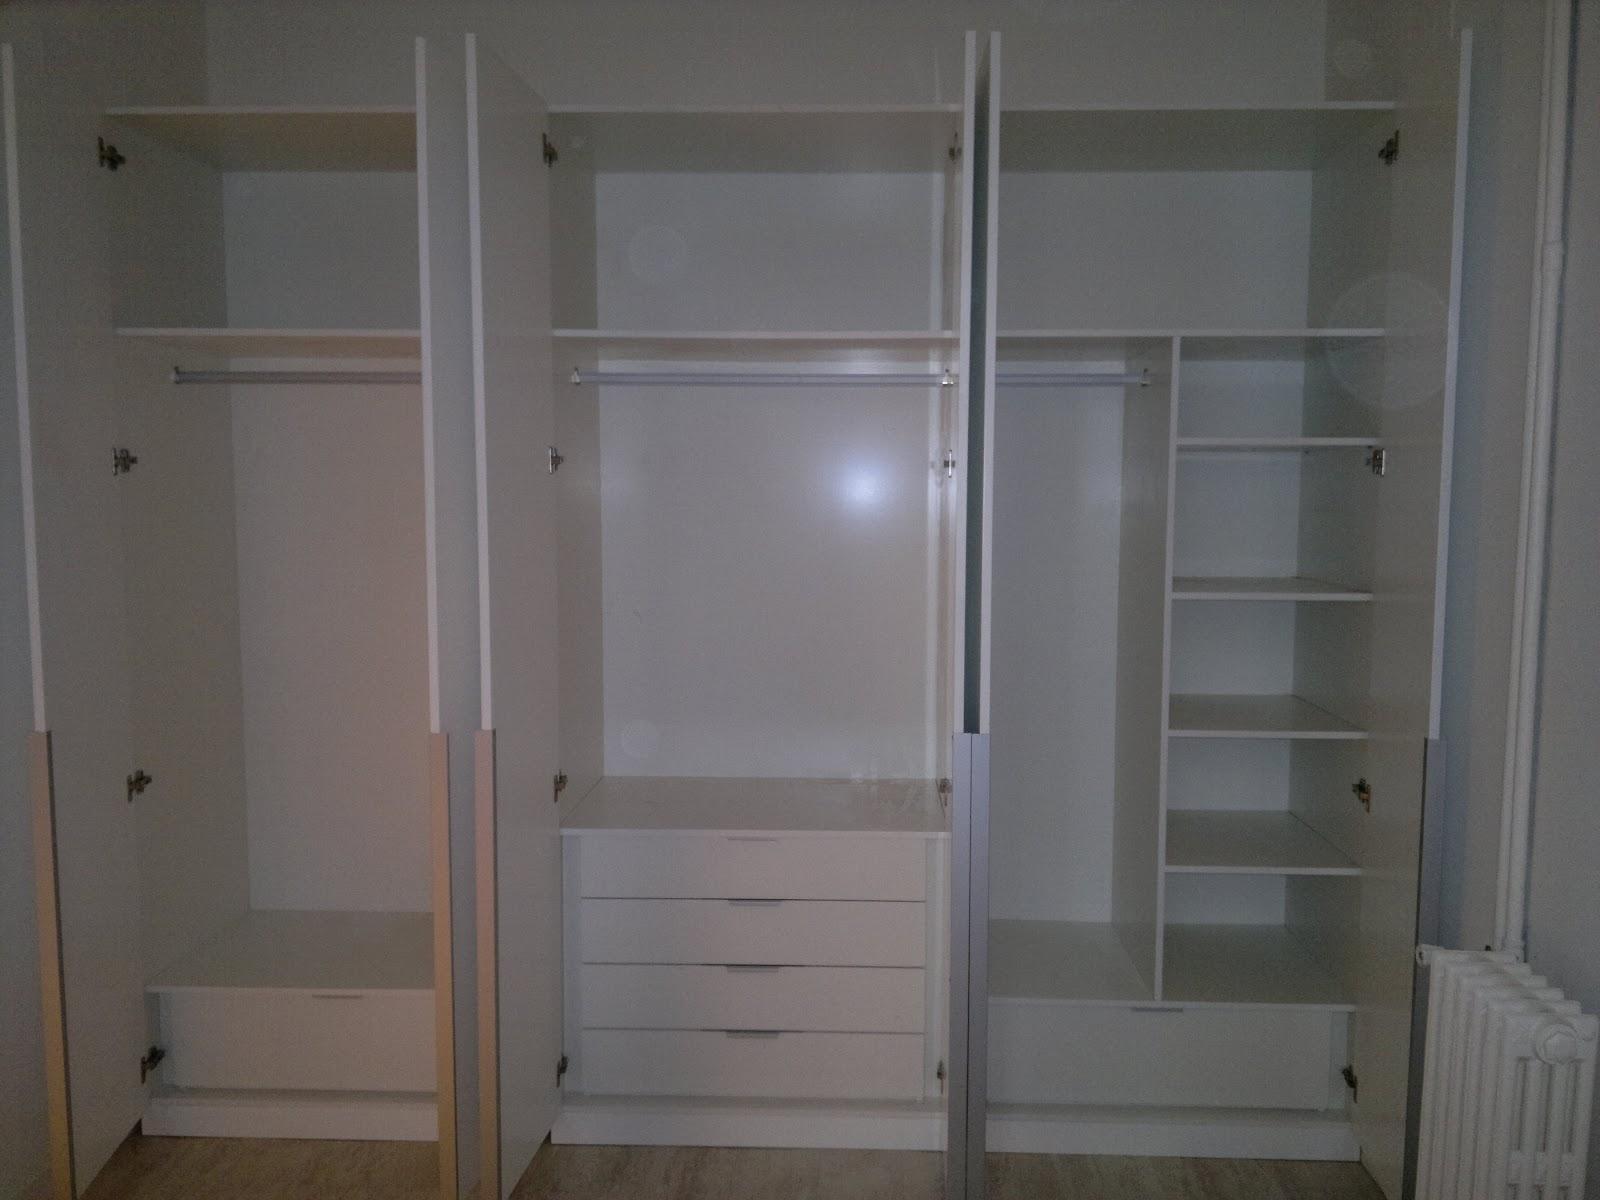 Ebanisteria carpinteria manuel perez zaragoza for Interiores de armarios